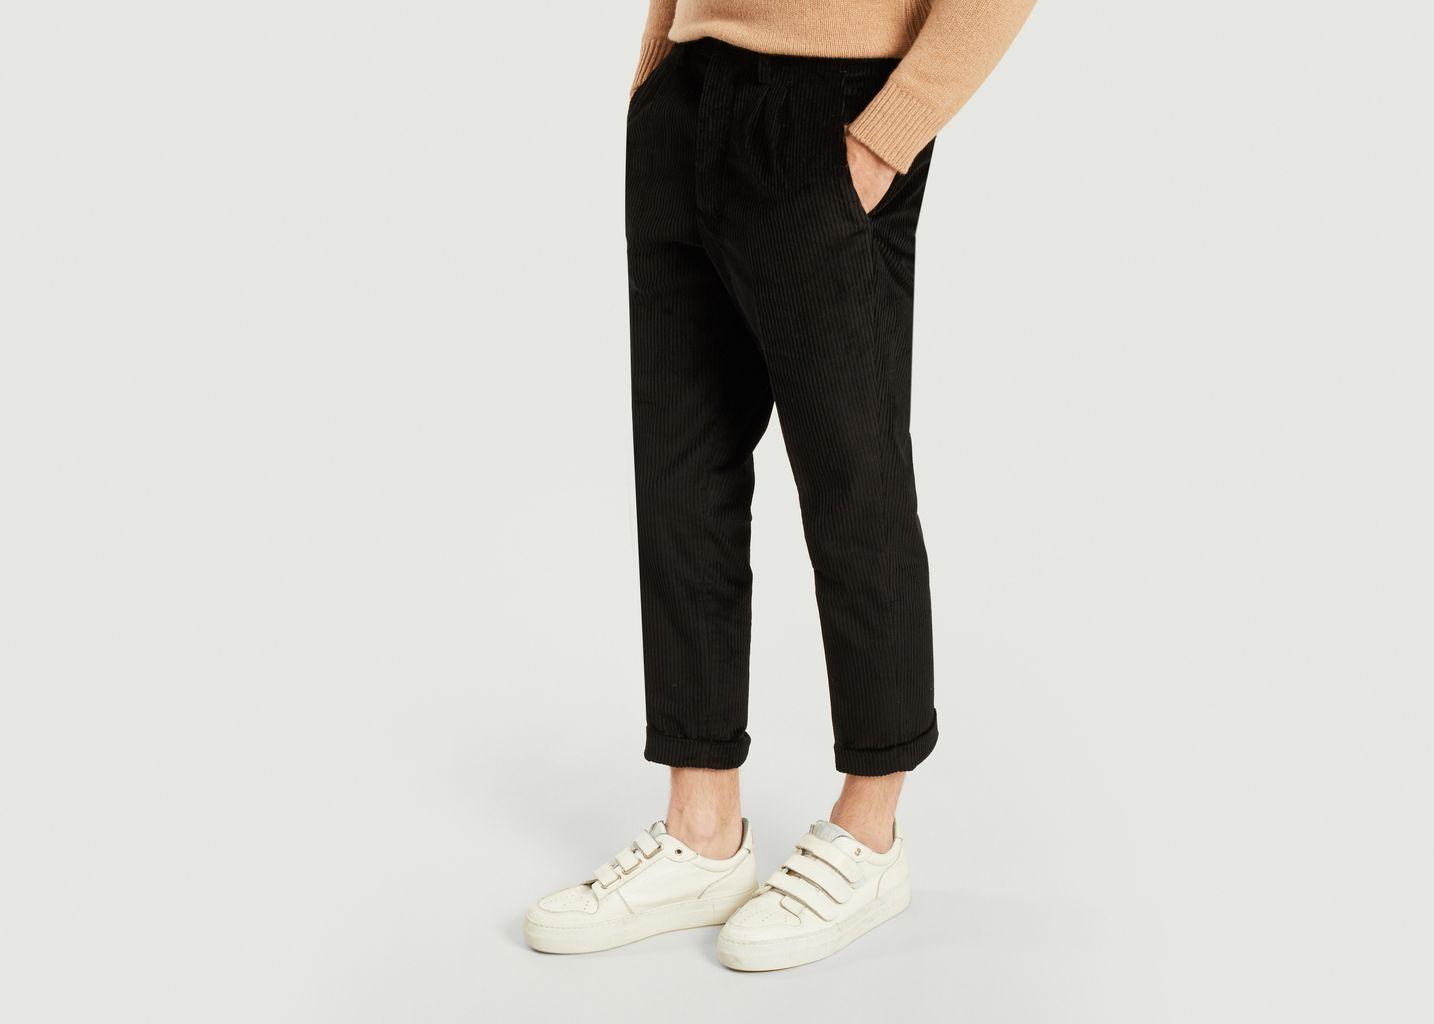 Pantalon Carotte à Plis  - AMI Paris